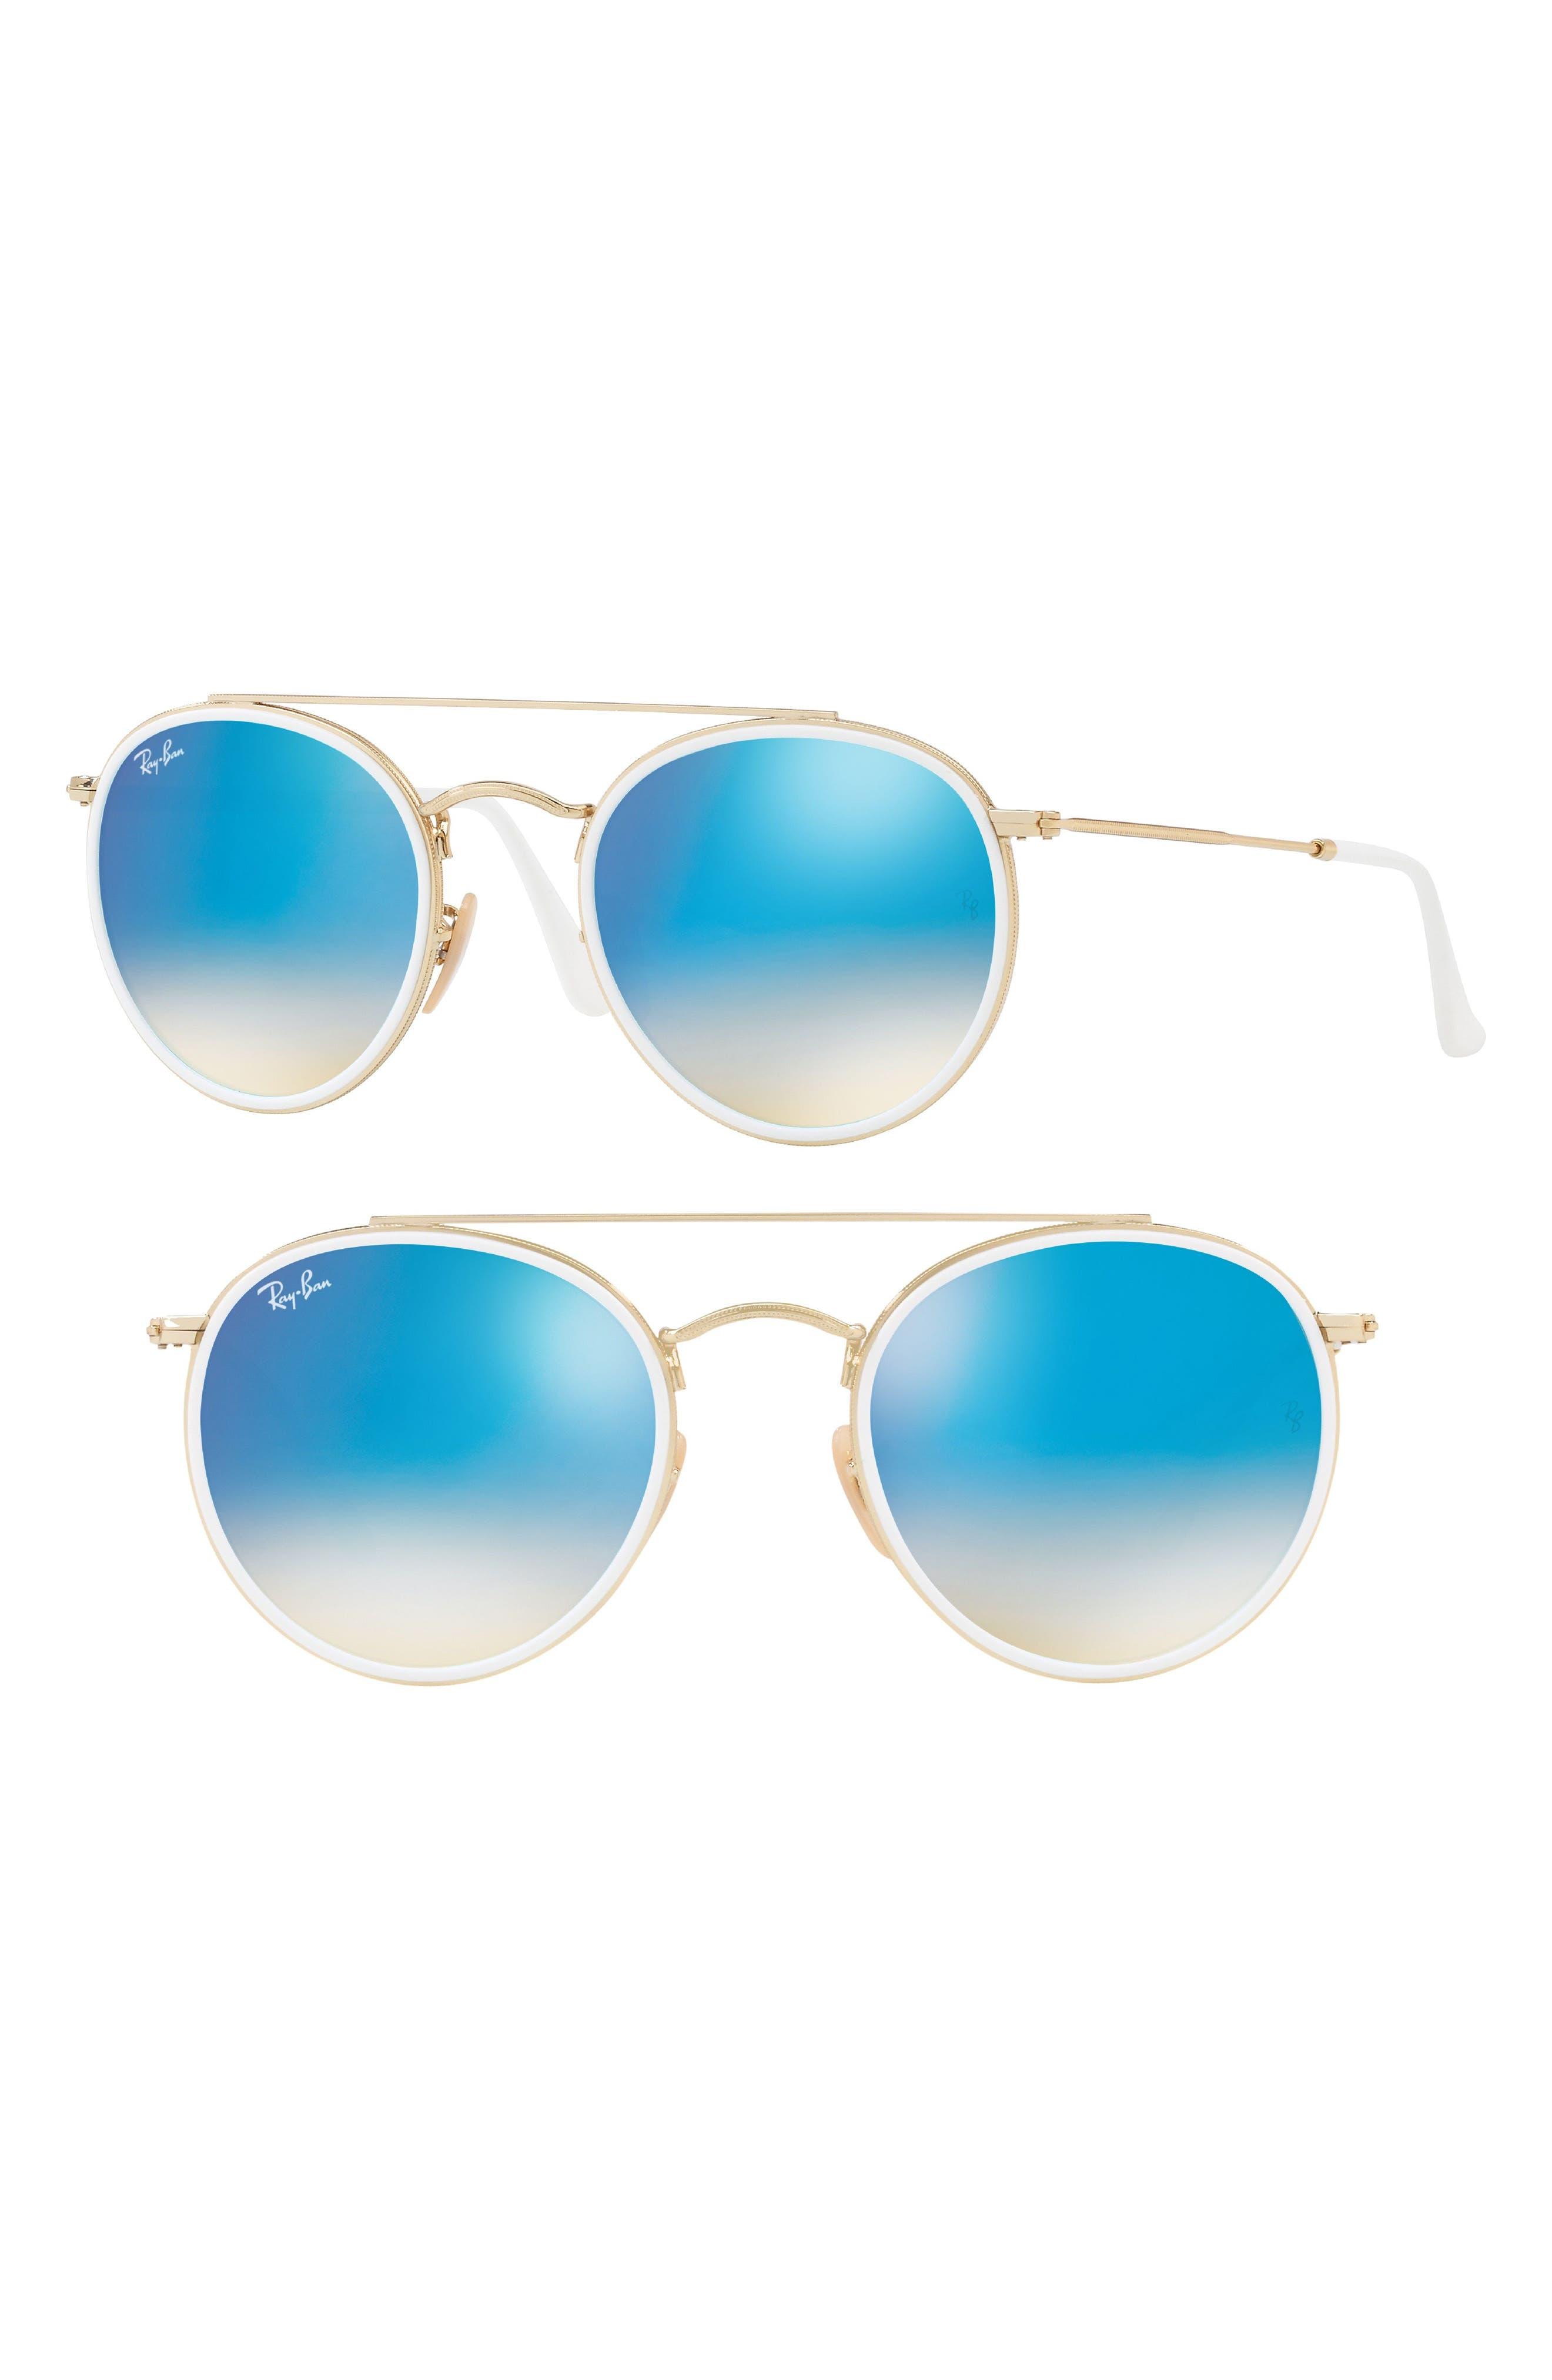 51mm Sunglasses,                             Main thumbnail 1, color,                             715